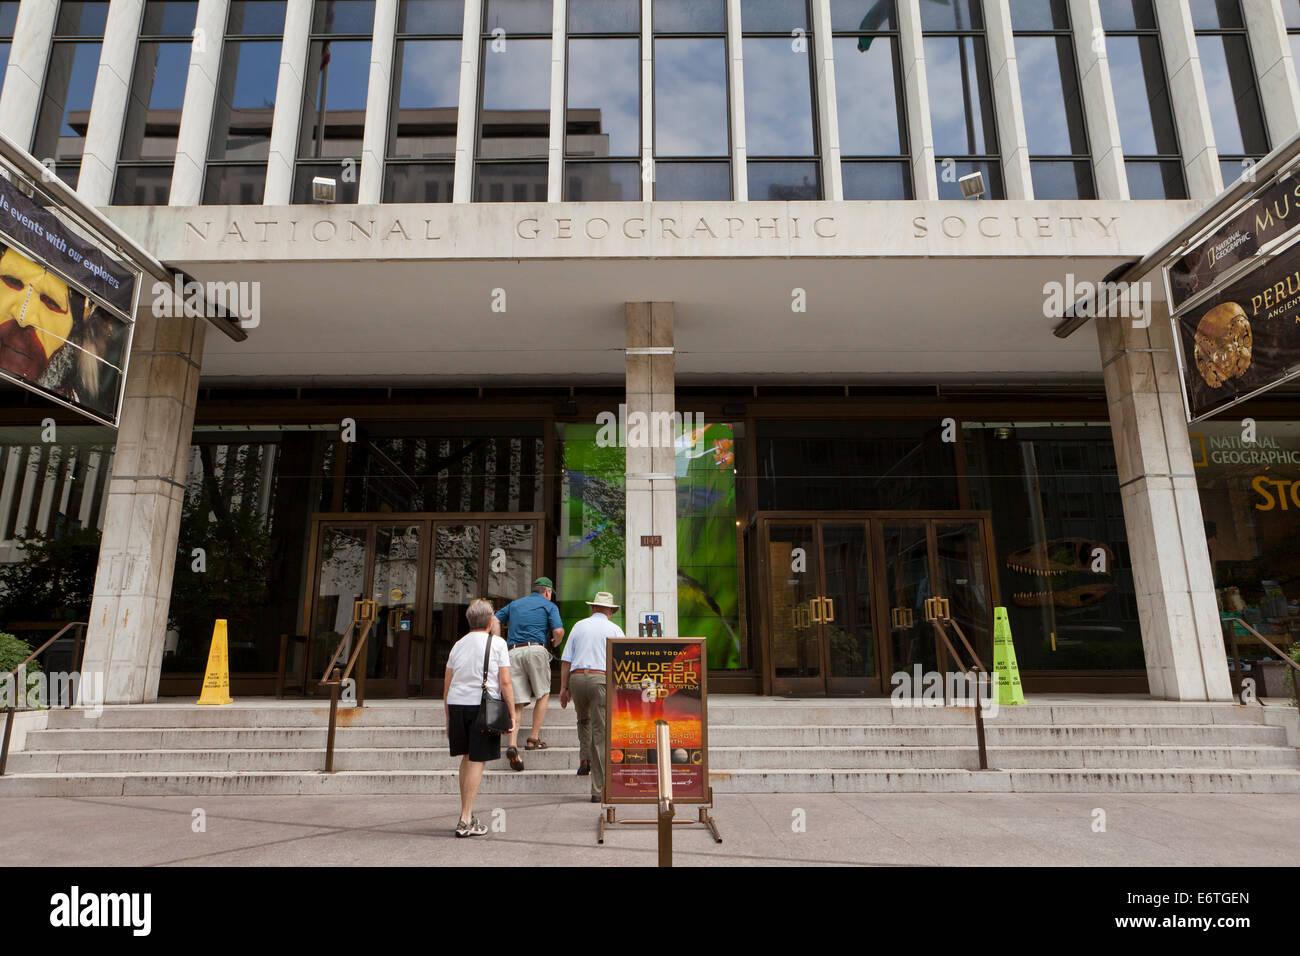 National Geographic Society headquarters building - Washington, DC USA - Stock Image